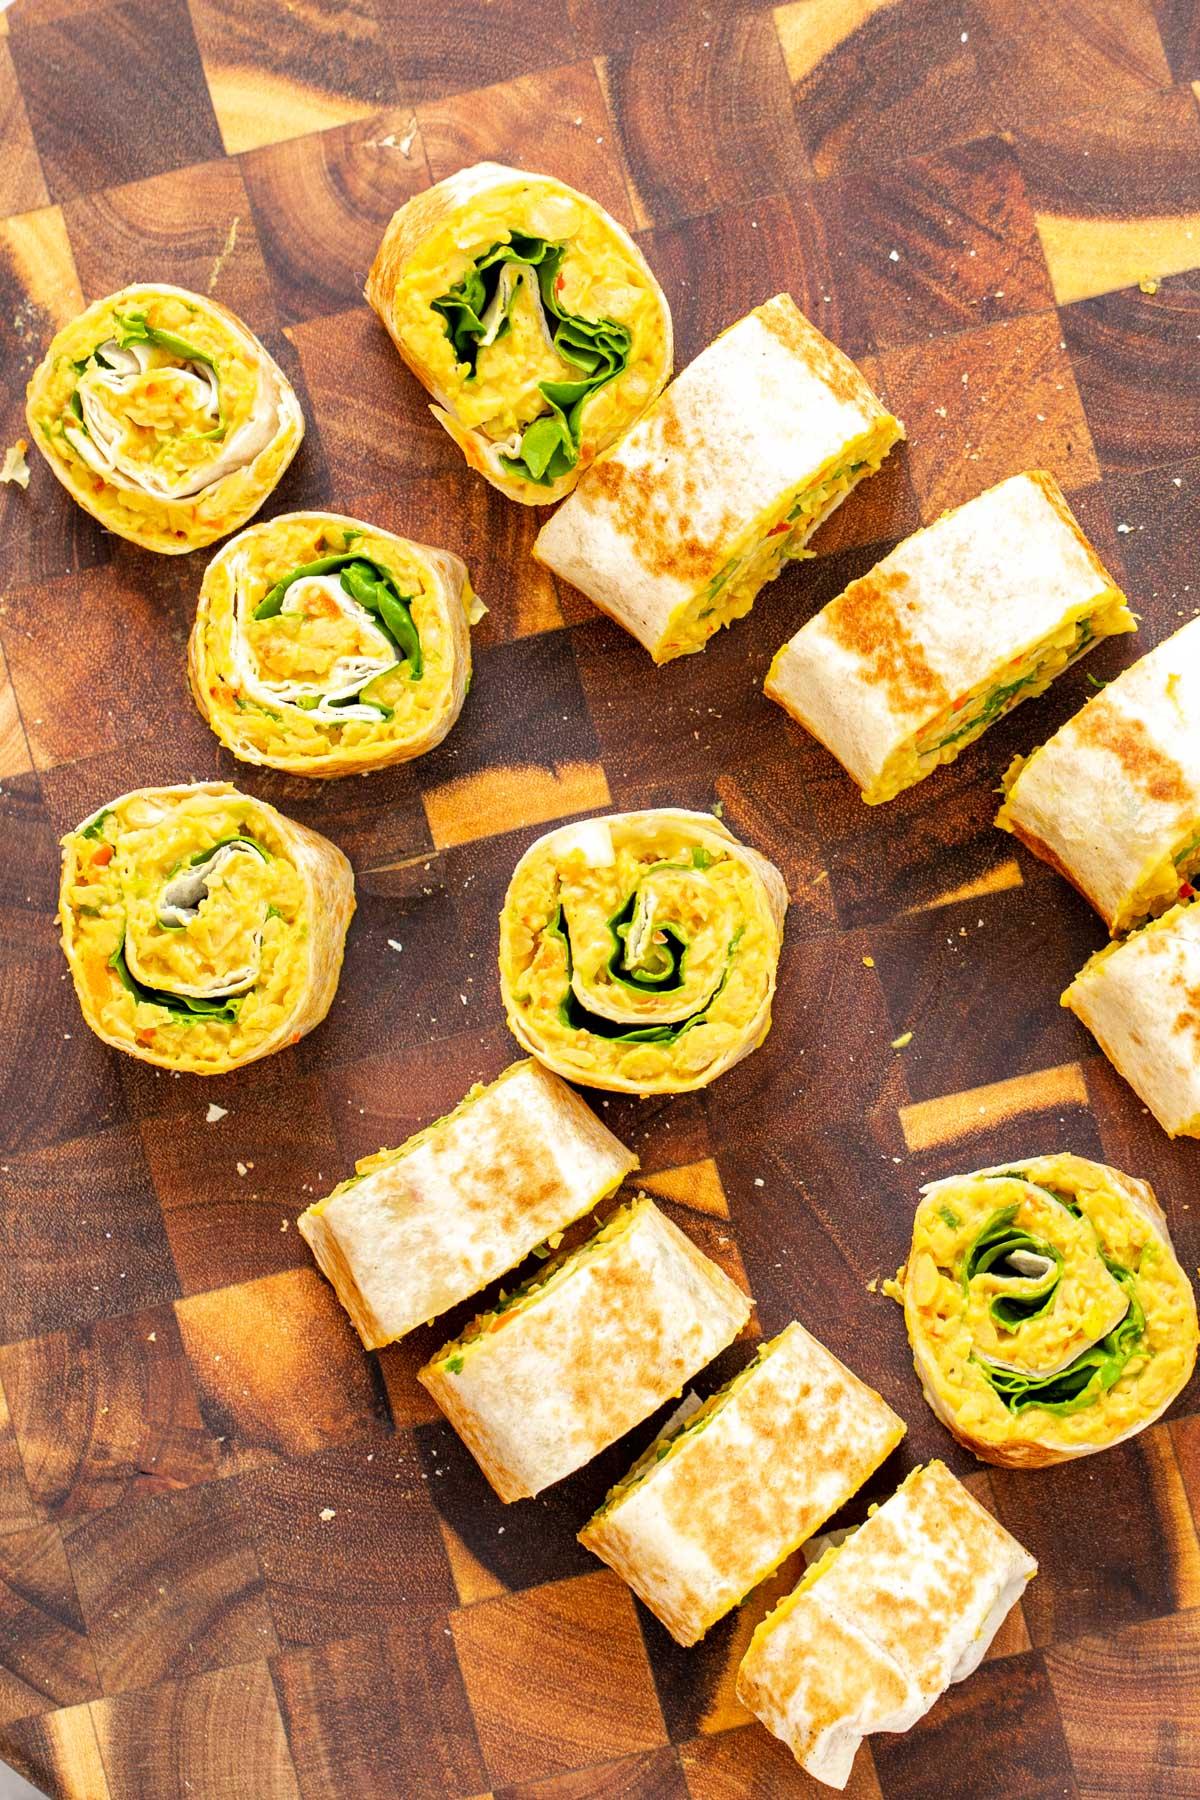 vegan chickpea scramble wraps being sliced into pinwheels